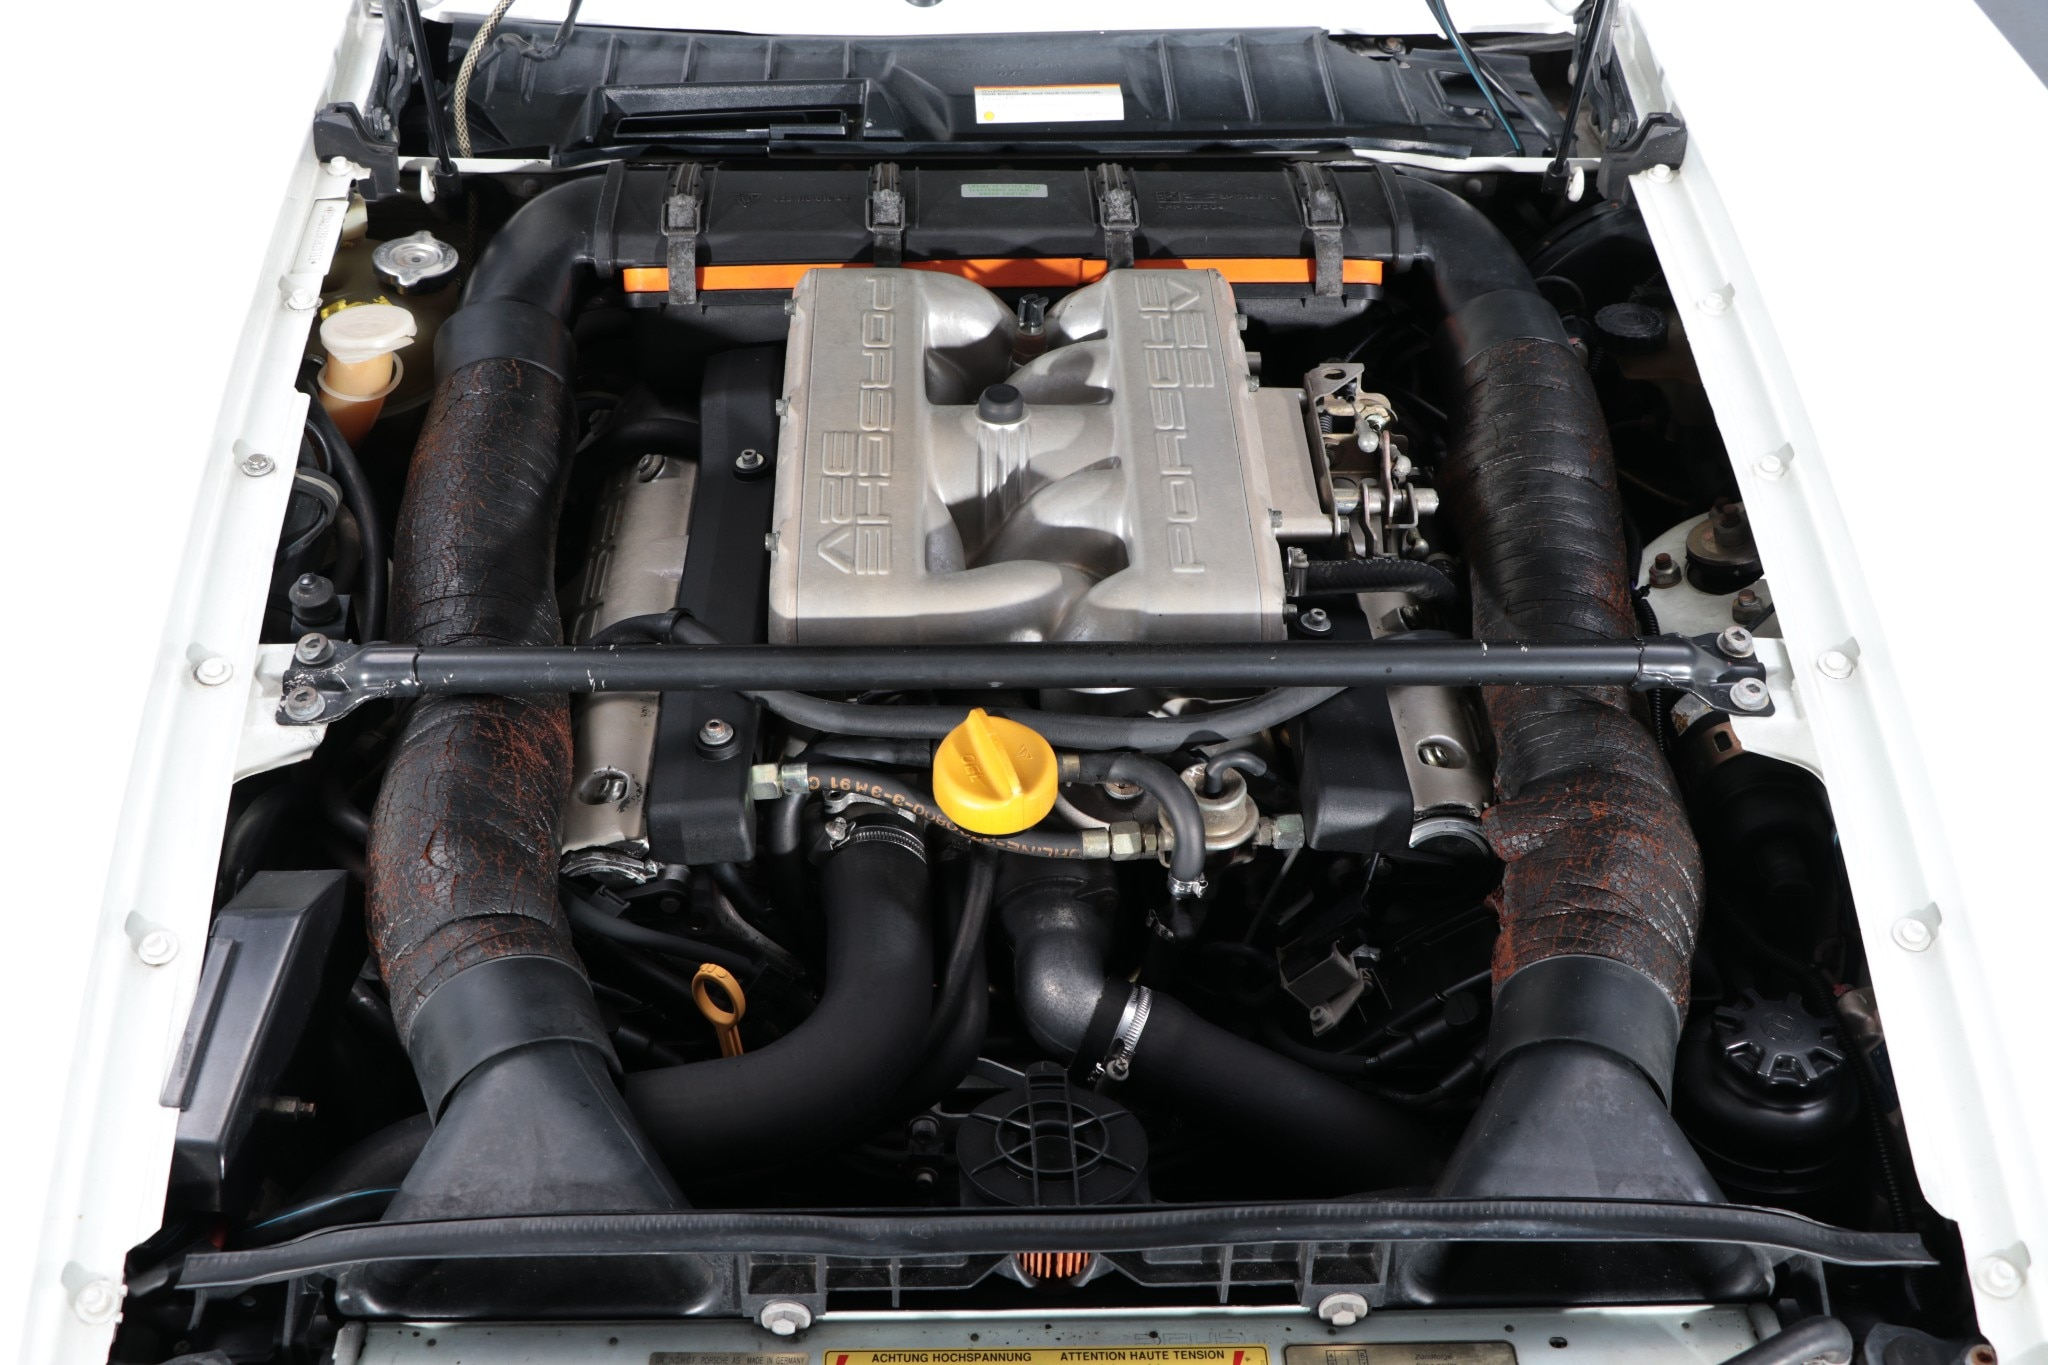 1993 Porsche 928 Gts Electrical Wiring Diagram